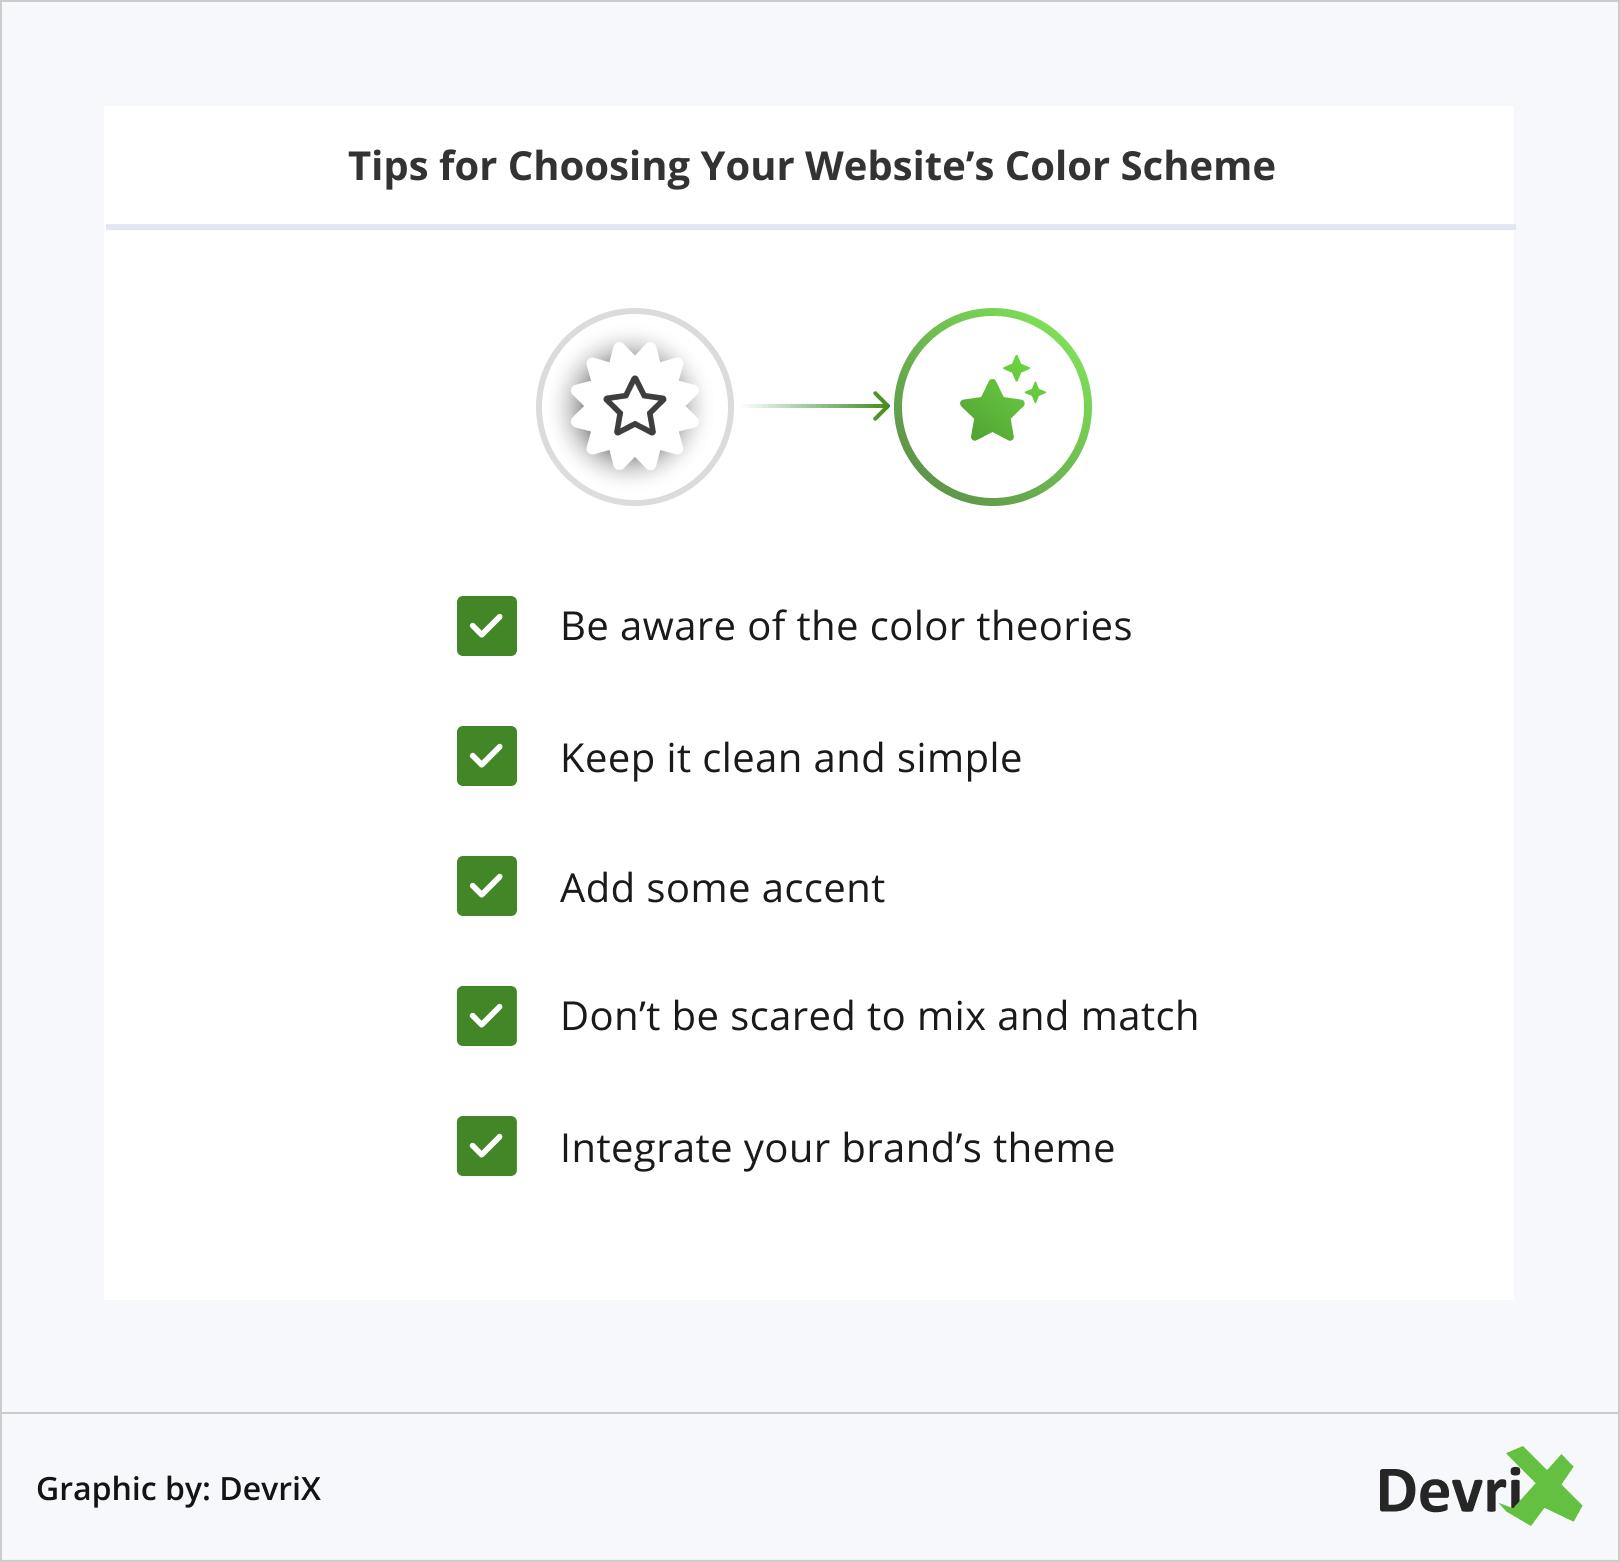 Tips for Choosing Your Website's Color Scheme